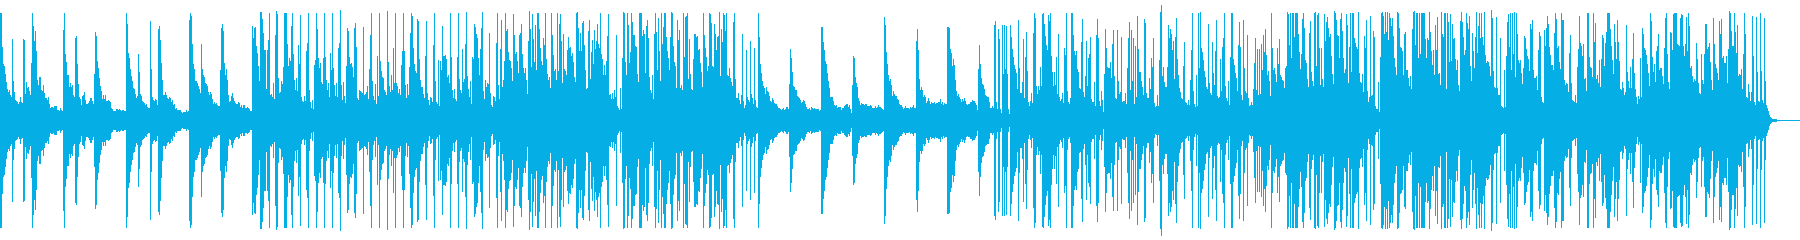 memory. R & B_2's reproduced waveform